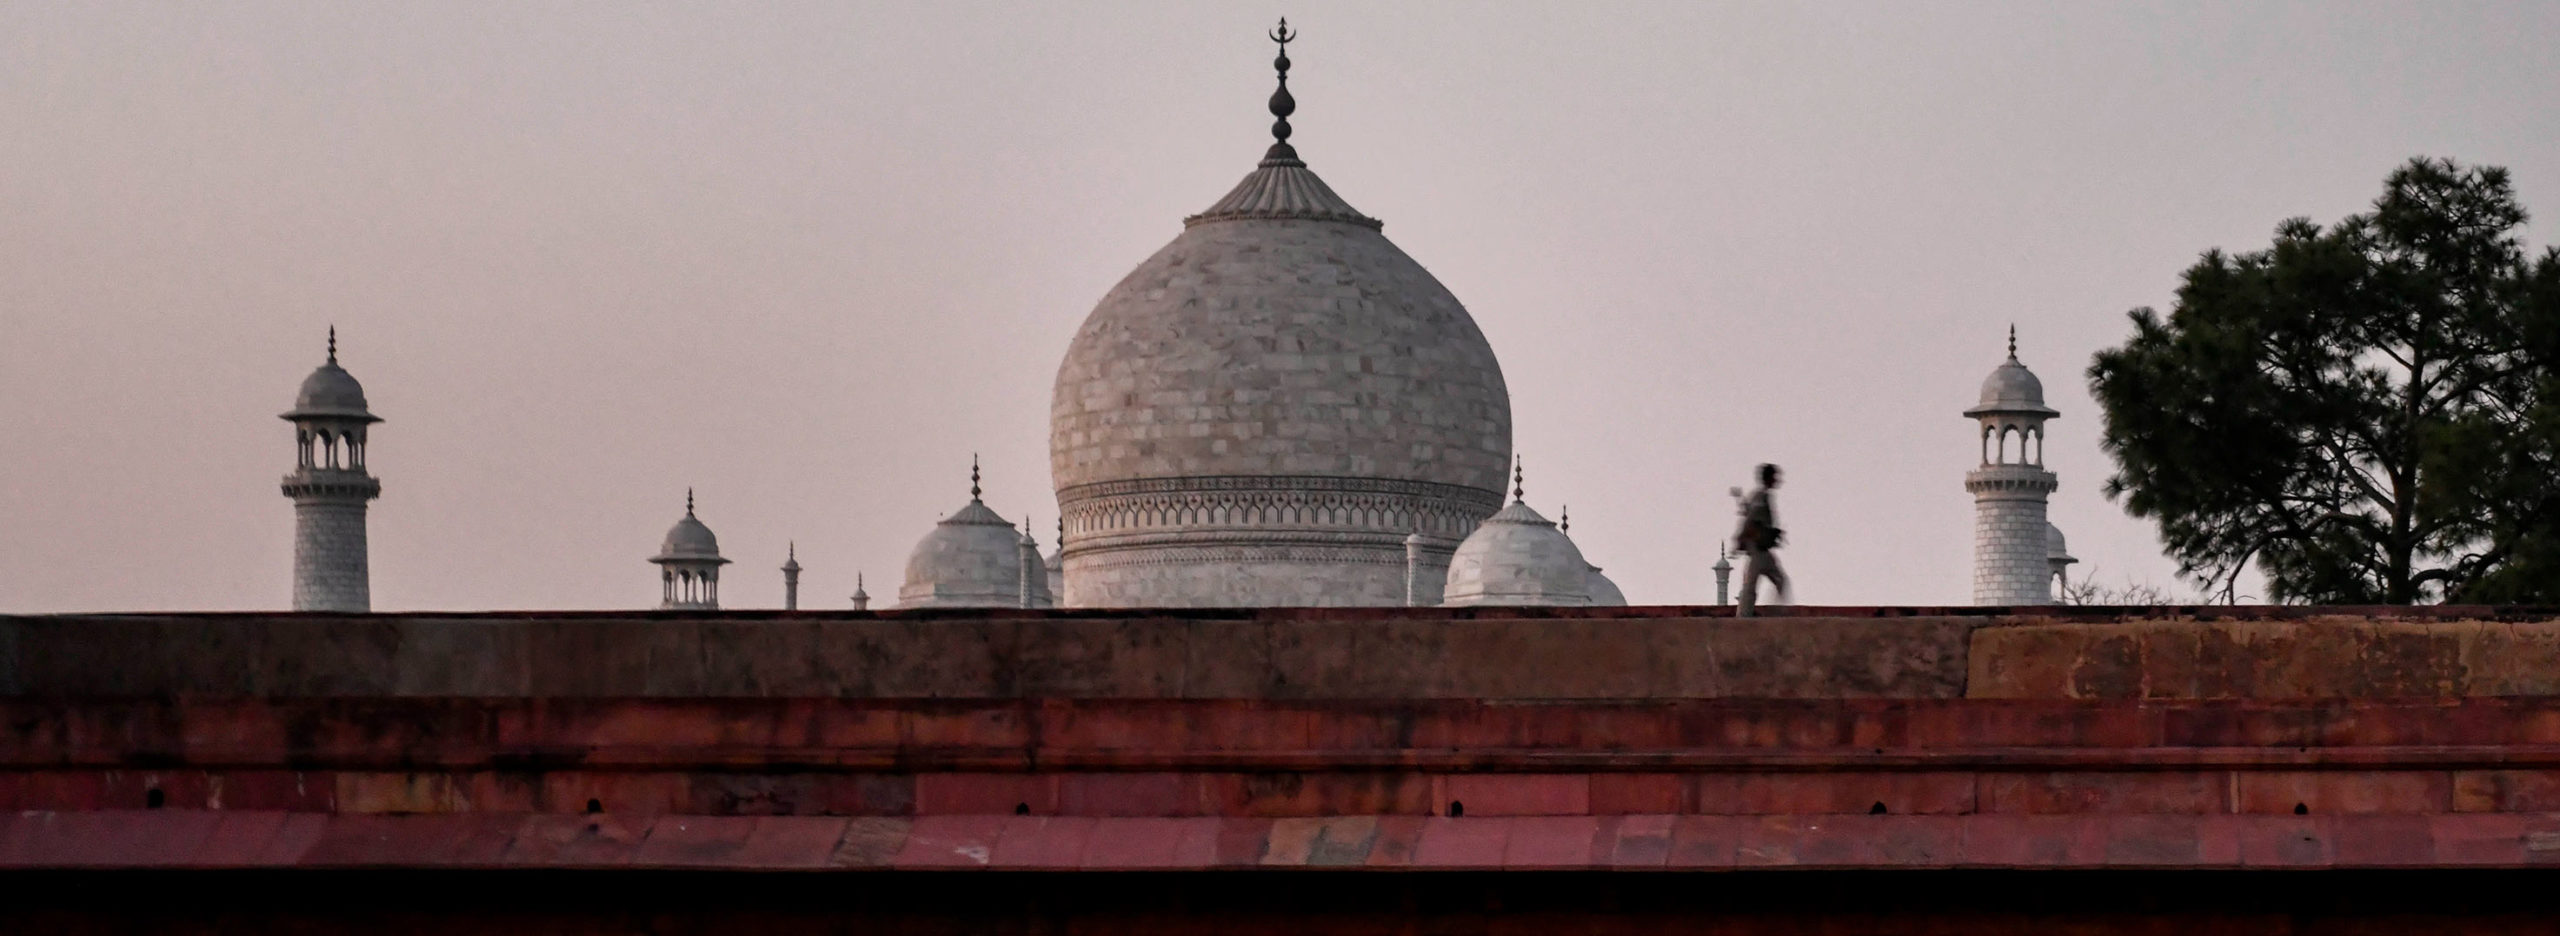 The Taj Mahal during the lockdown